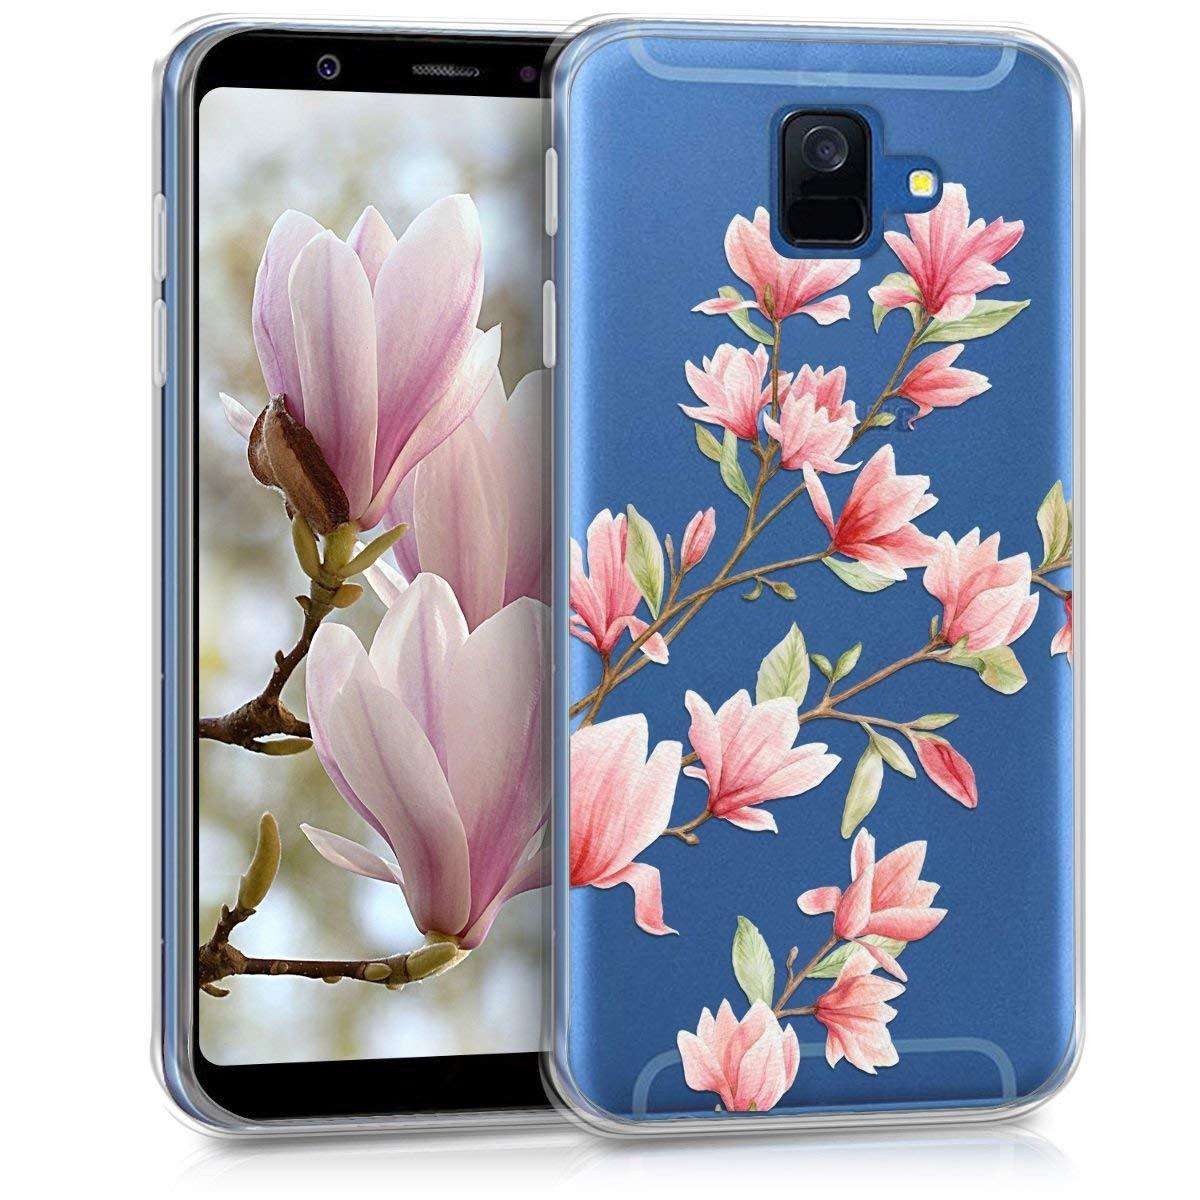 KW Θήκη Σιλικόνης Samsung Galaxy A6 2018 - Magnolias Light Pink White (45250.02)